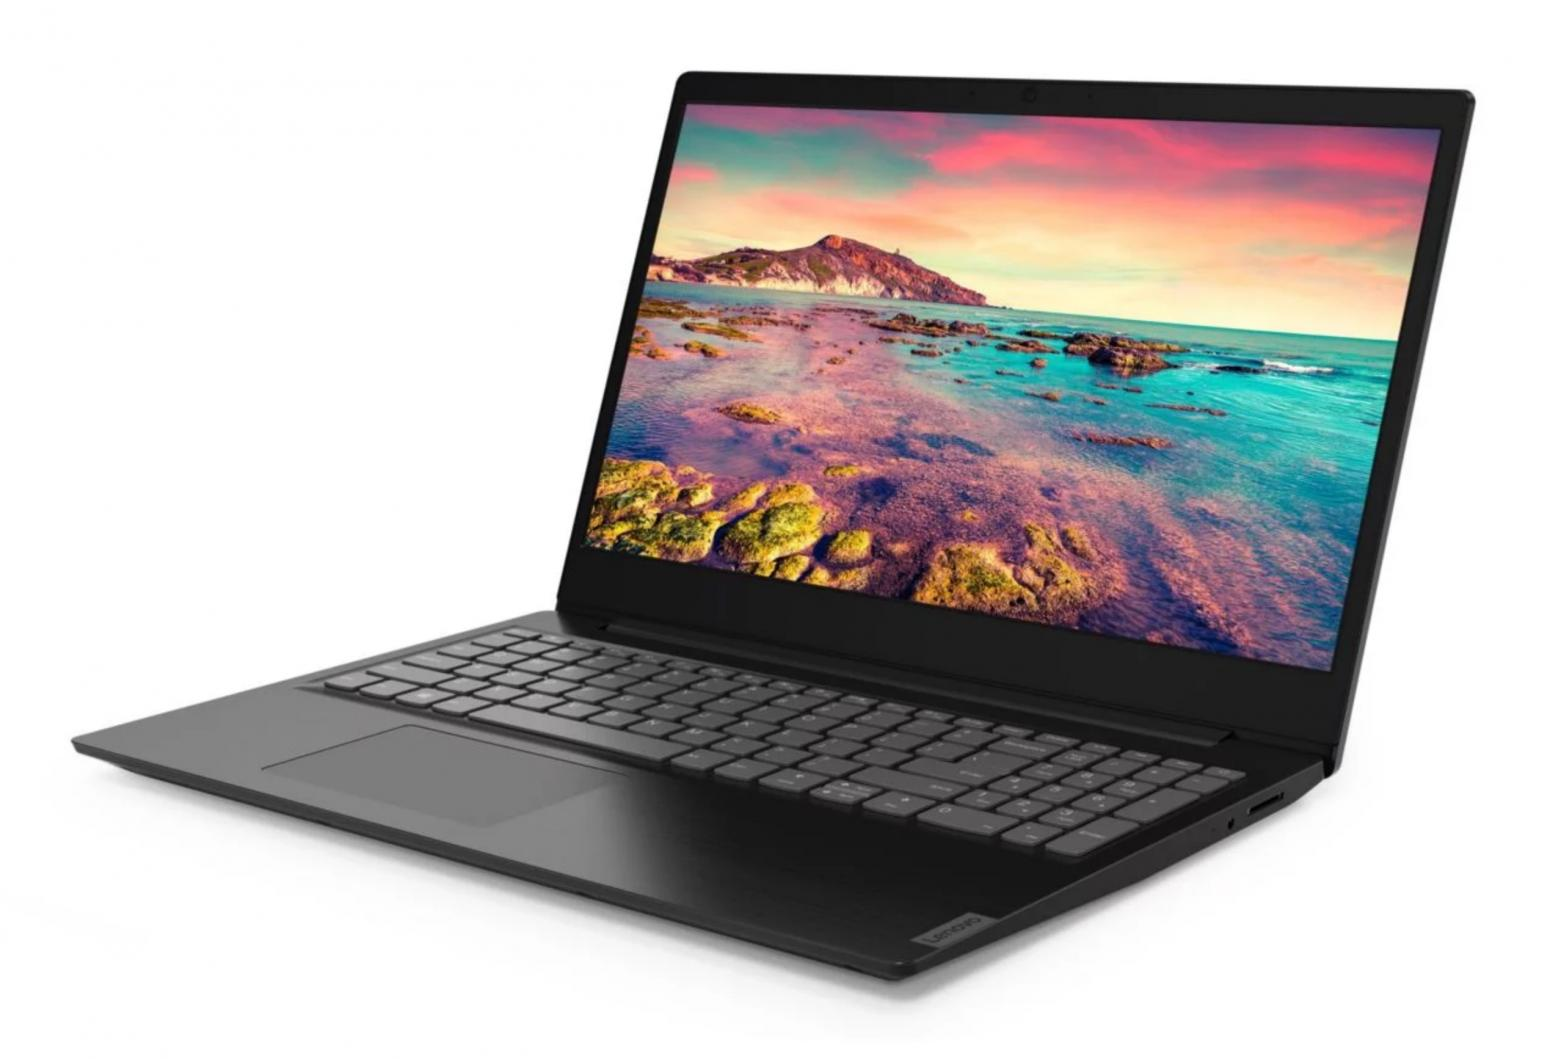 Ordinateur portable Lenovo Ideapad S145-15IWL (81MV006QFR) Noir - MX110 - photo 2